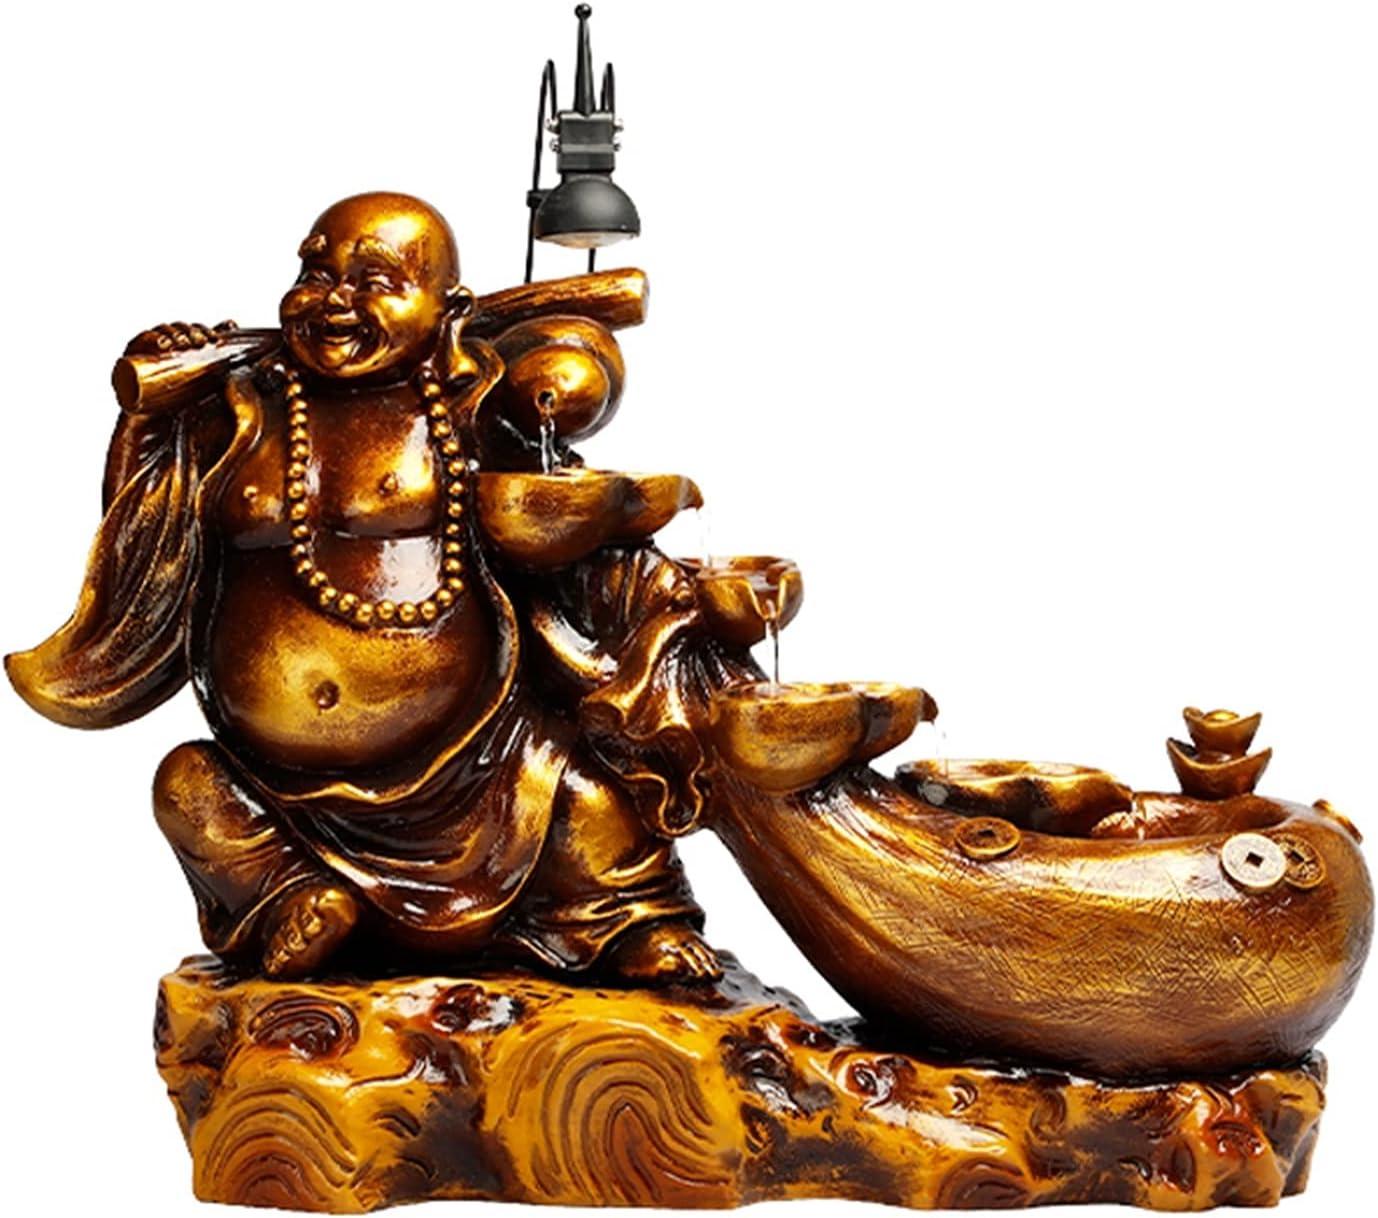 hongbanlemp Bombing new work Cheap SALE Start Tabletop Fountains 16.5 Buddha Inch Waterfa